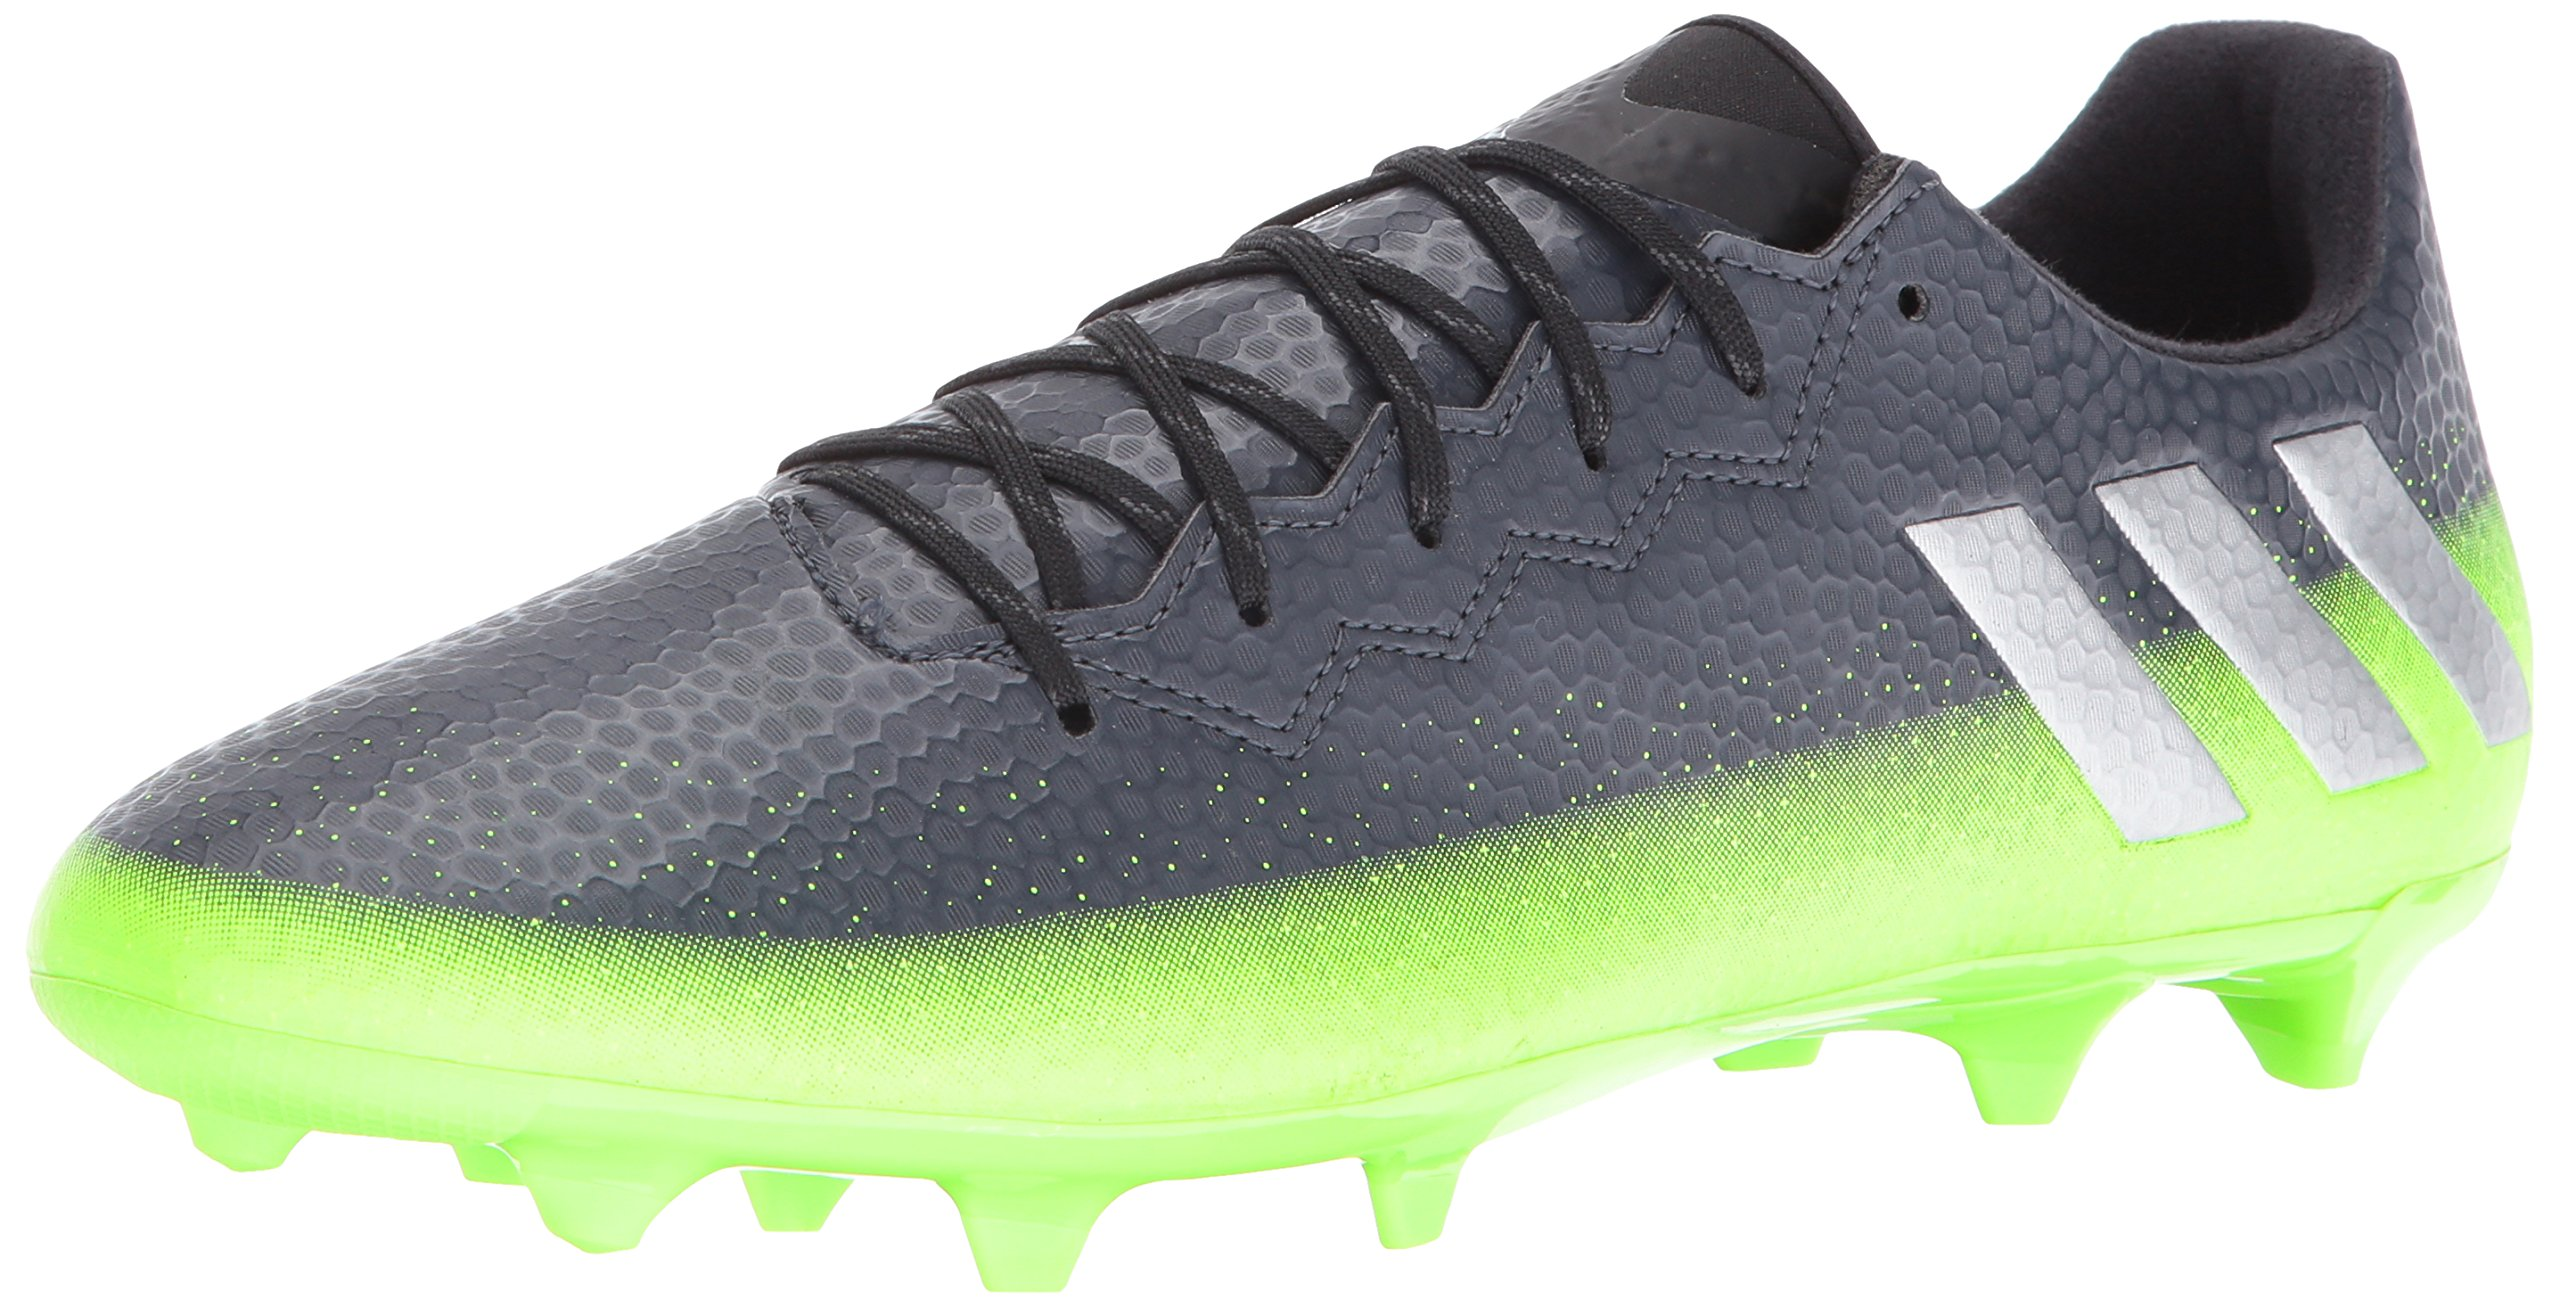 48e24fb7e Galleon - Adidas Performance Men s Messi 16.3 Fg Soccer Shoe